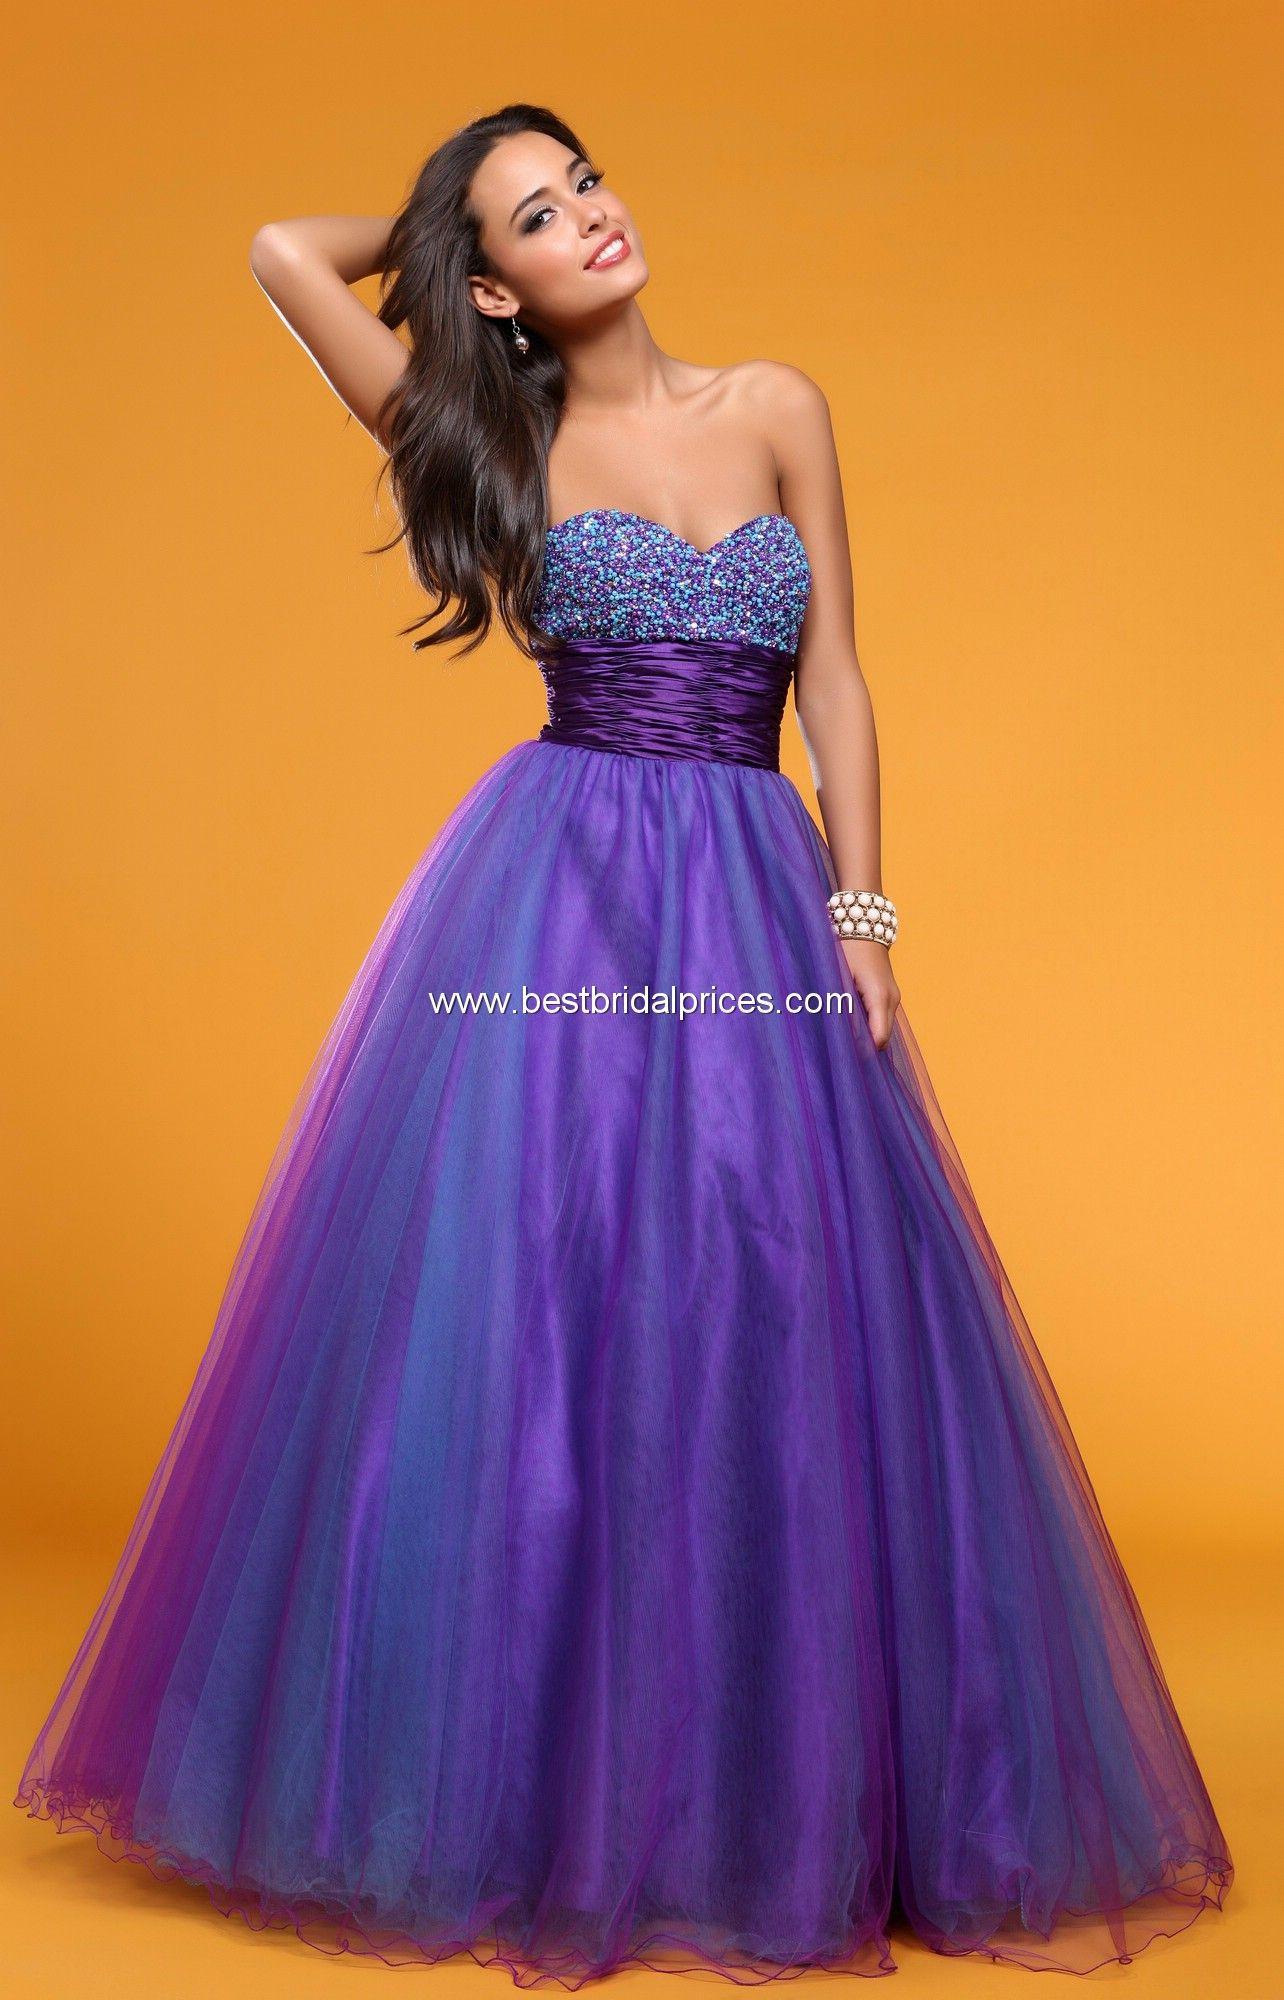 formal gown | Tickled Plum | Pinterest | Vestidos de noche, Noche y ...